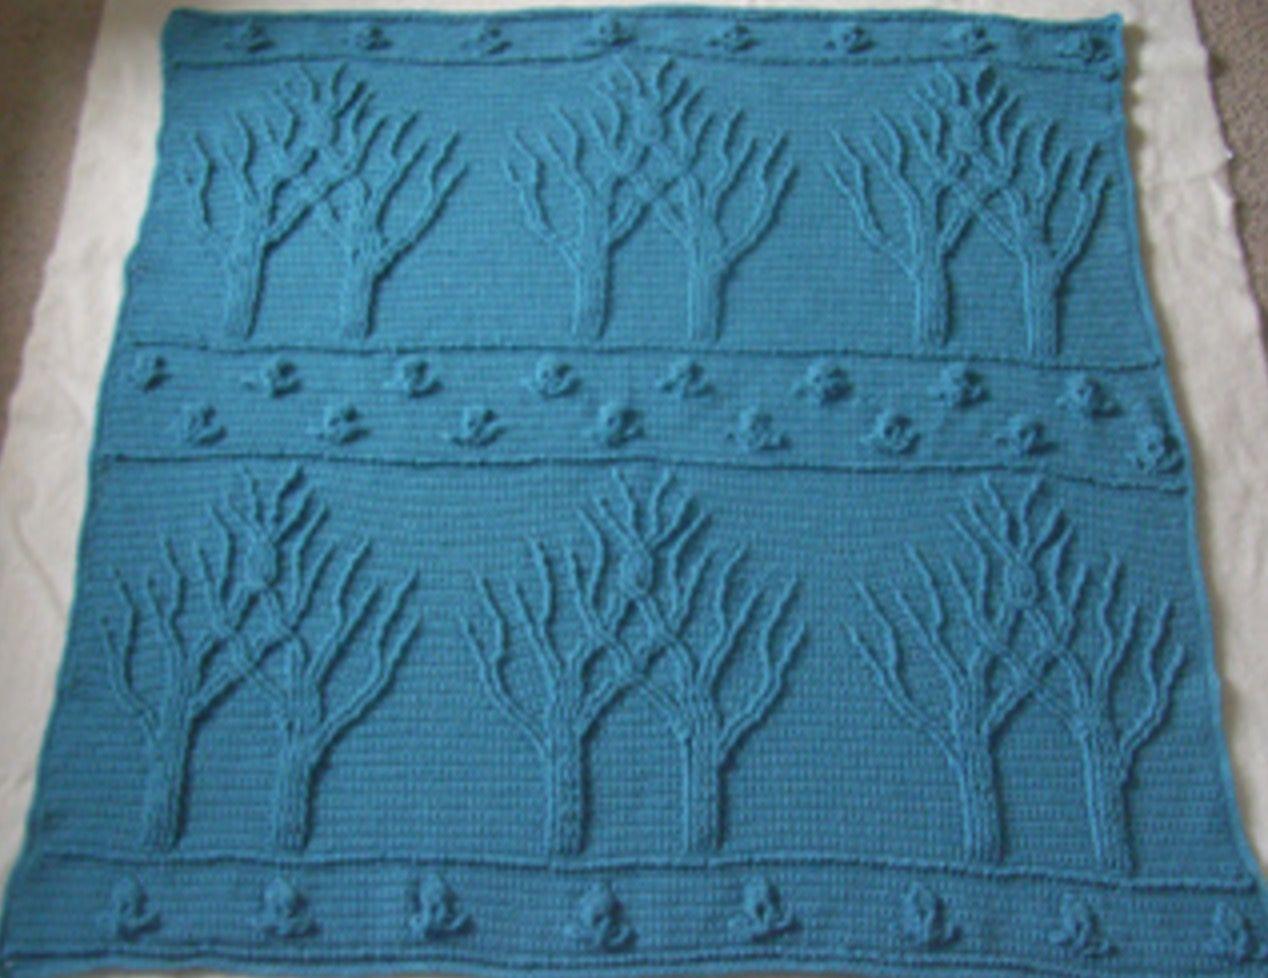 Tree Of Life Crochet Afghan Pattern Free | Tejido